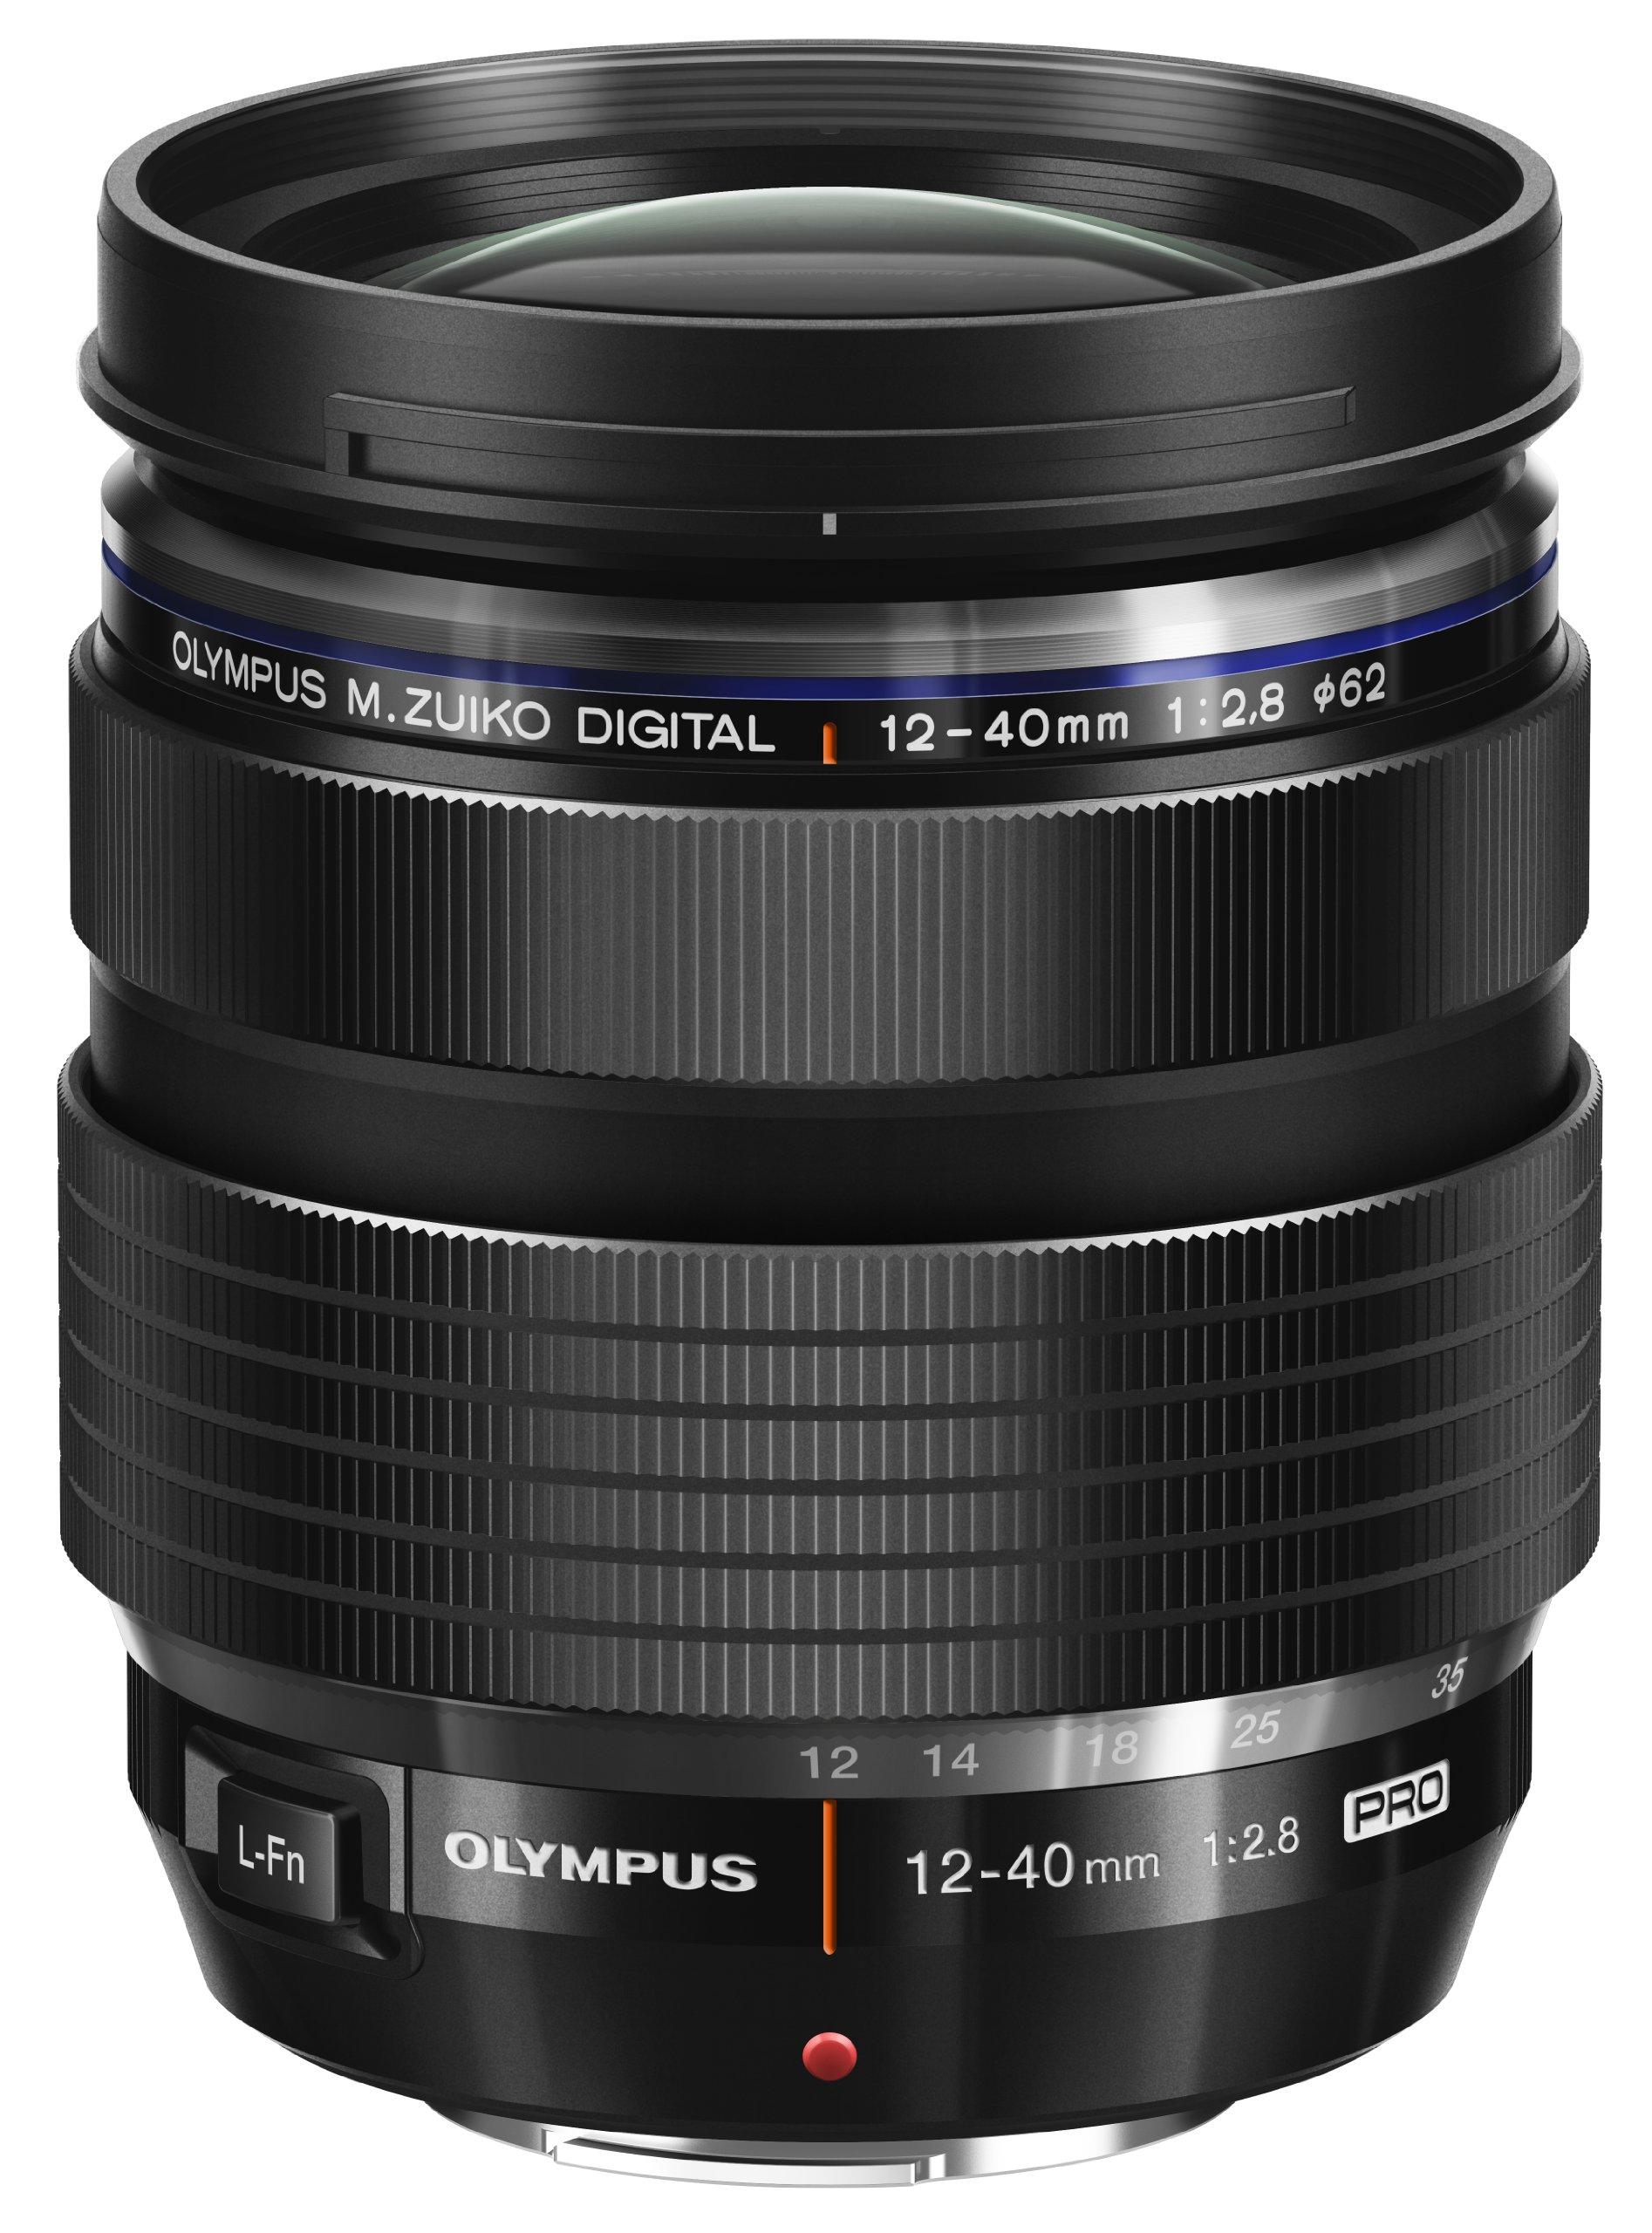 Olympus M.ZUIKO DIGITAL ED 12-40mm F2.8 PRO Interchangeable Lens by Olympus